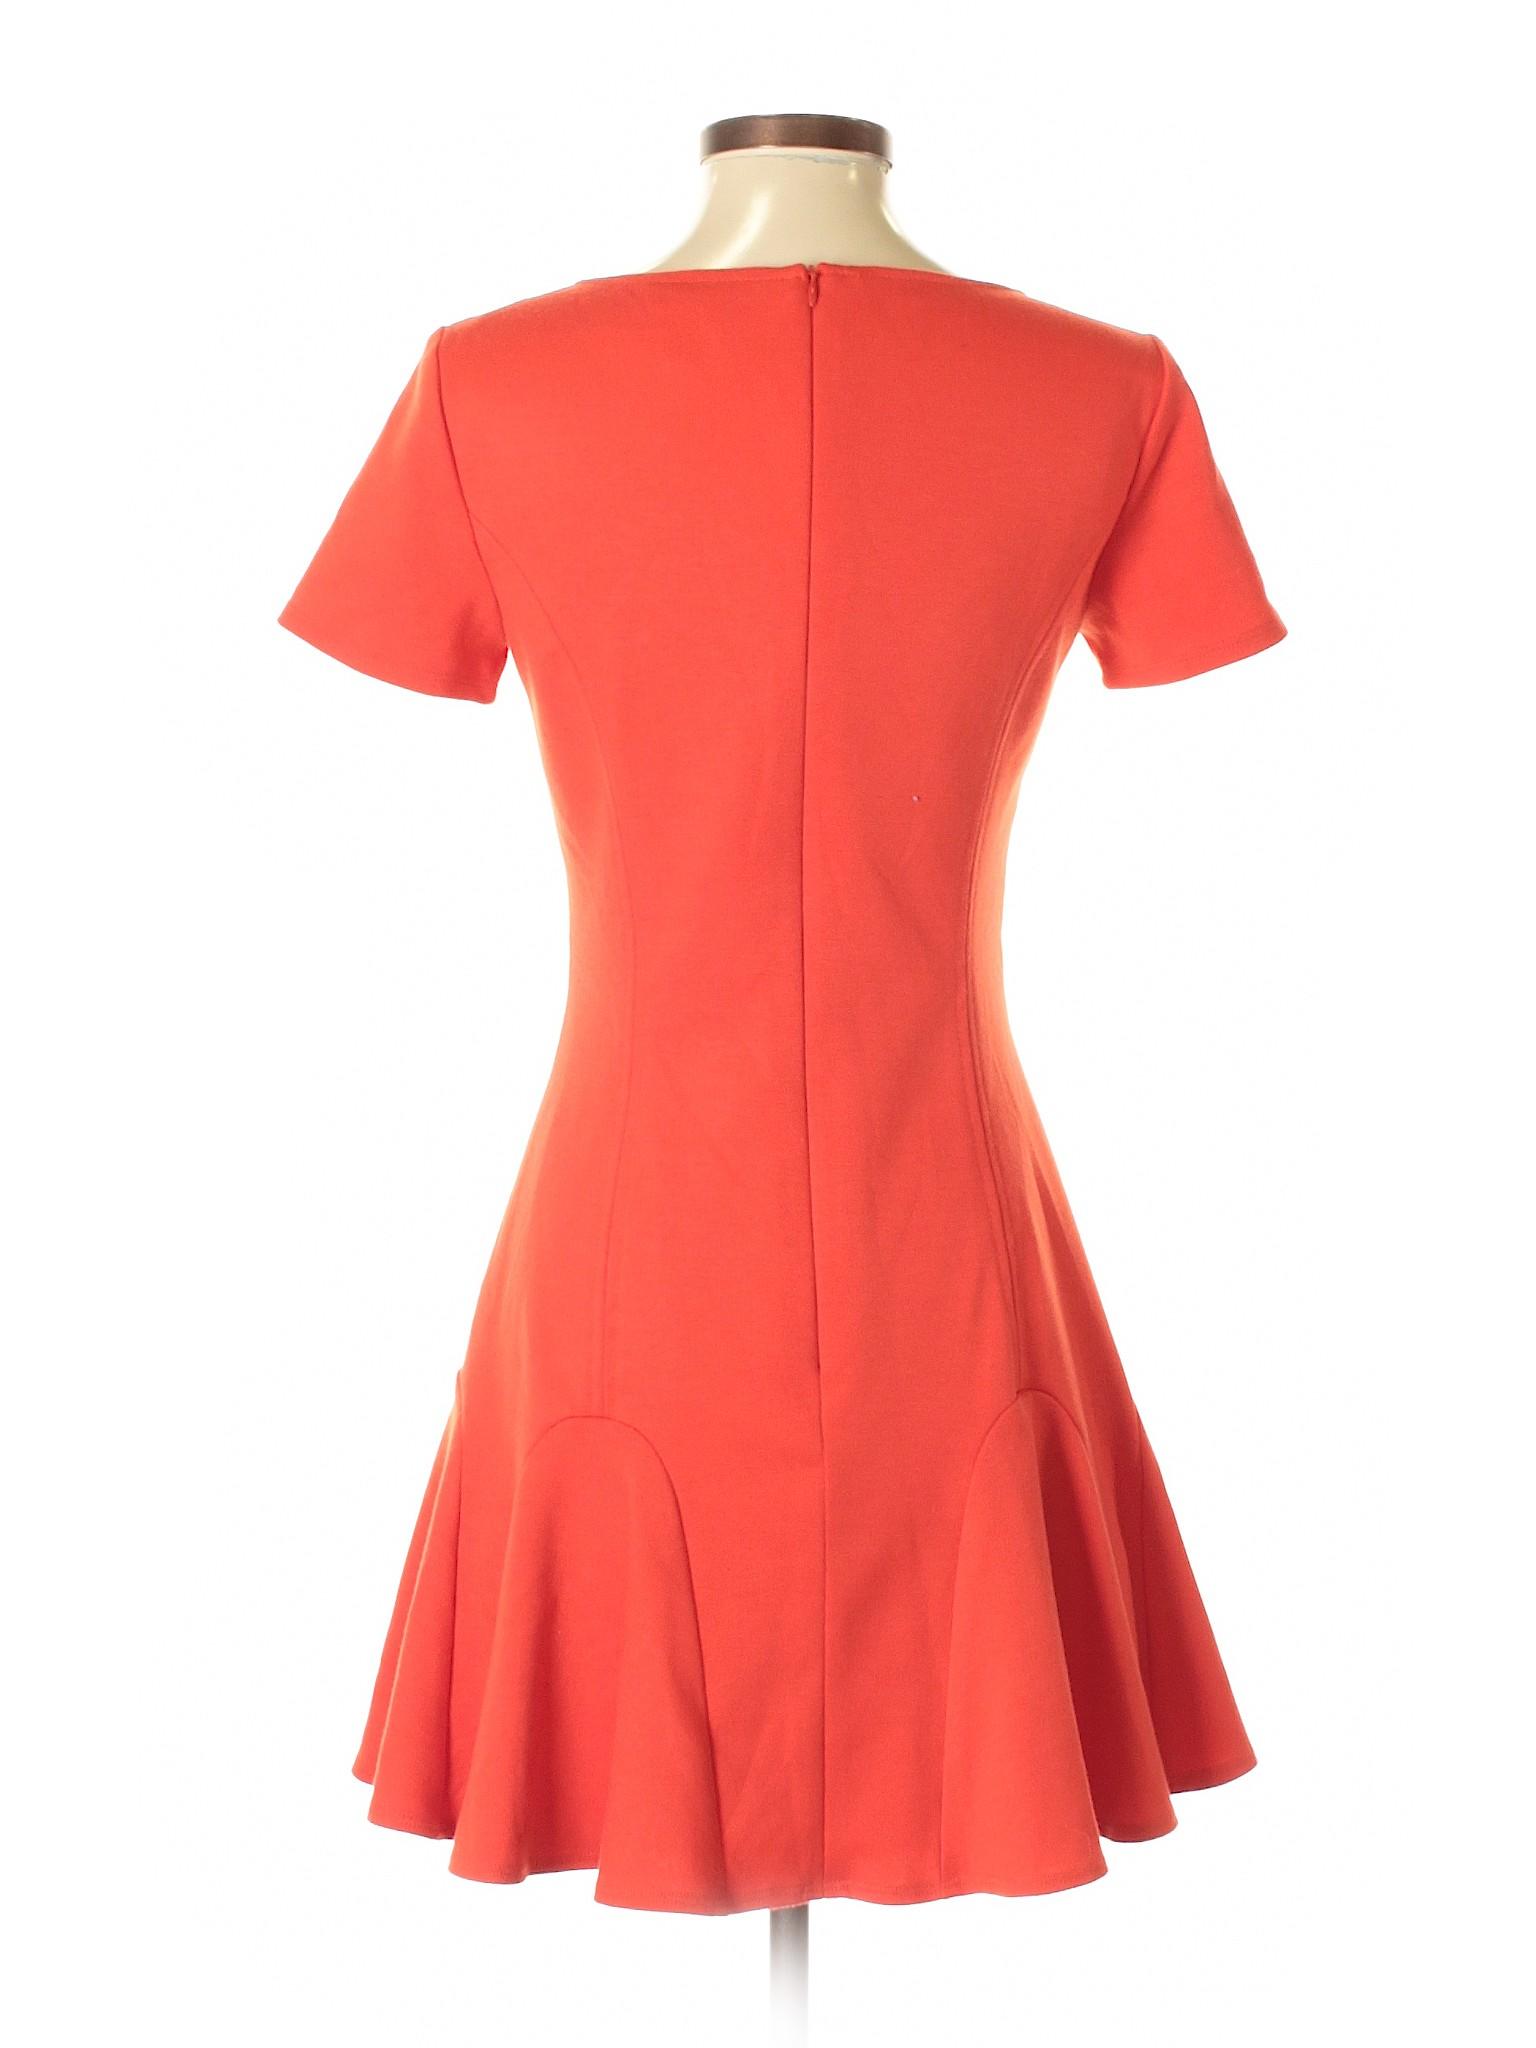 Turk Boutique Casual Trina Trina winter Dress qxz8fSn